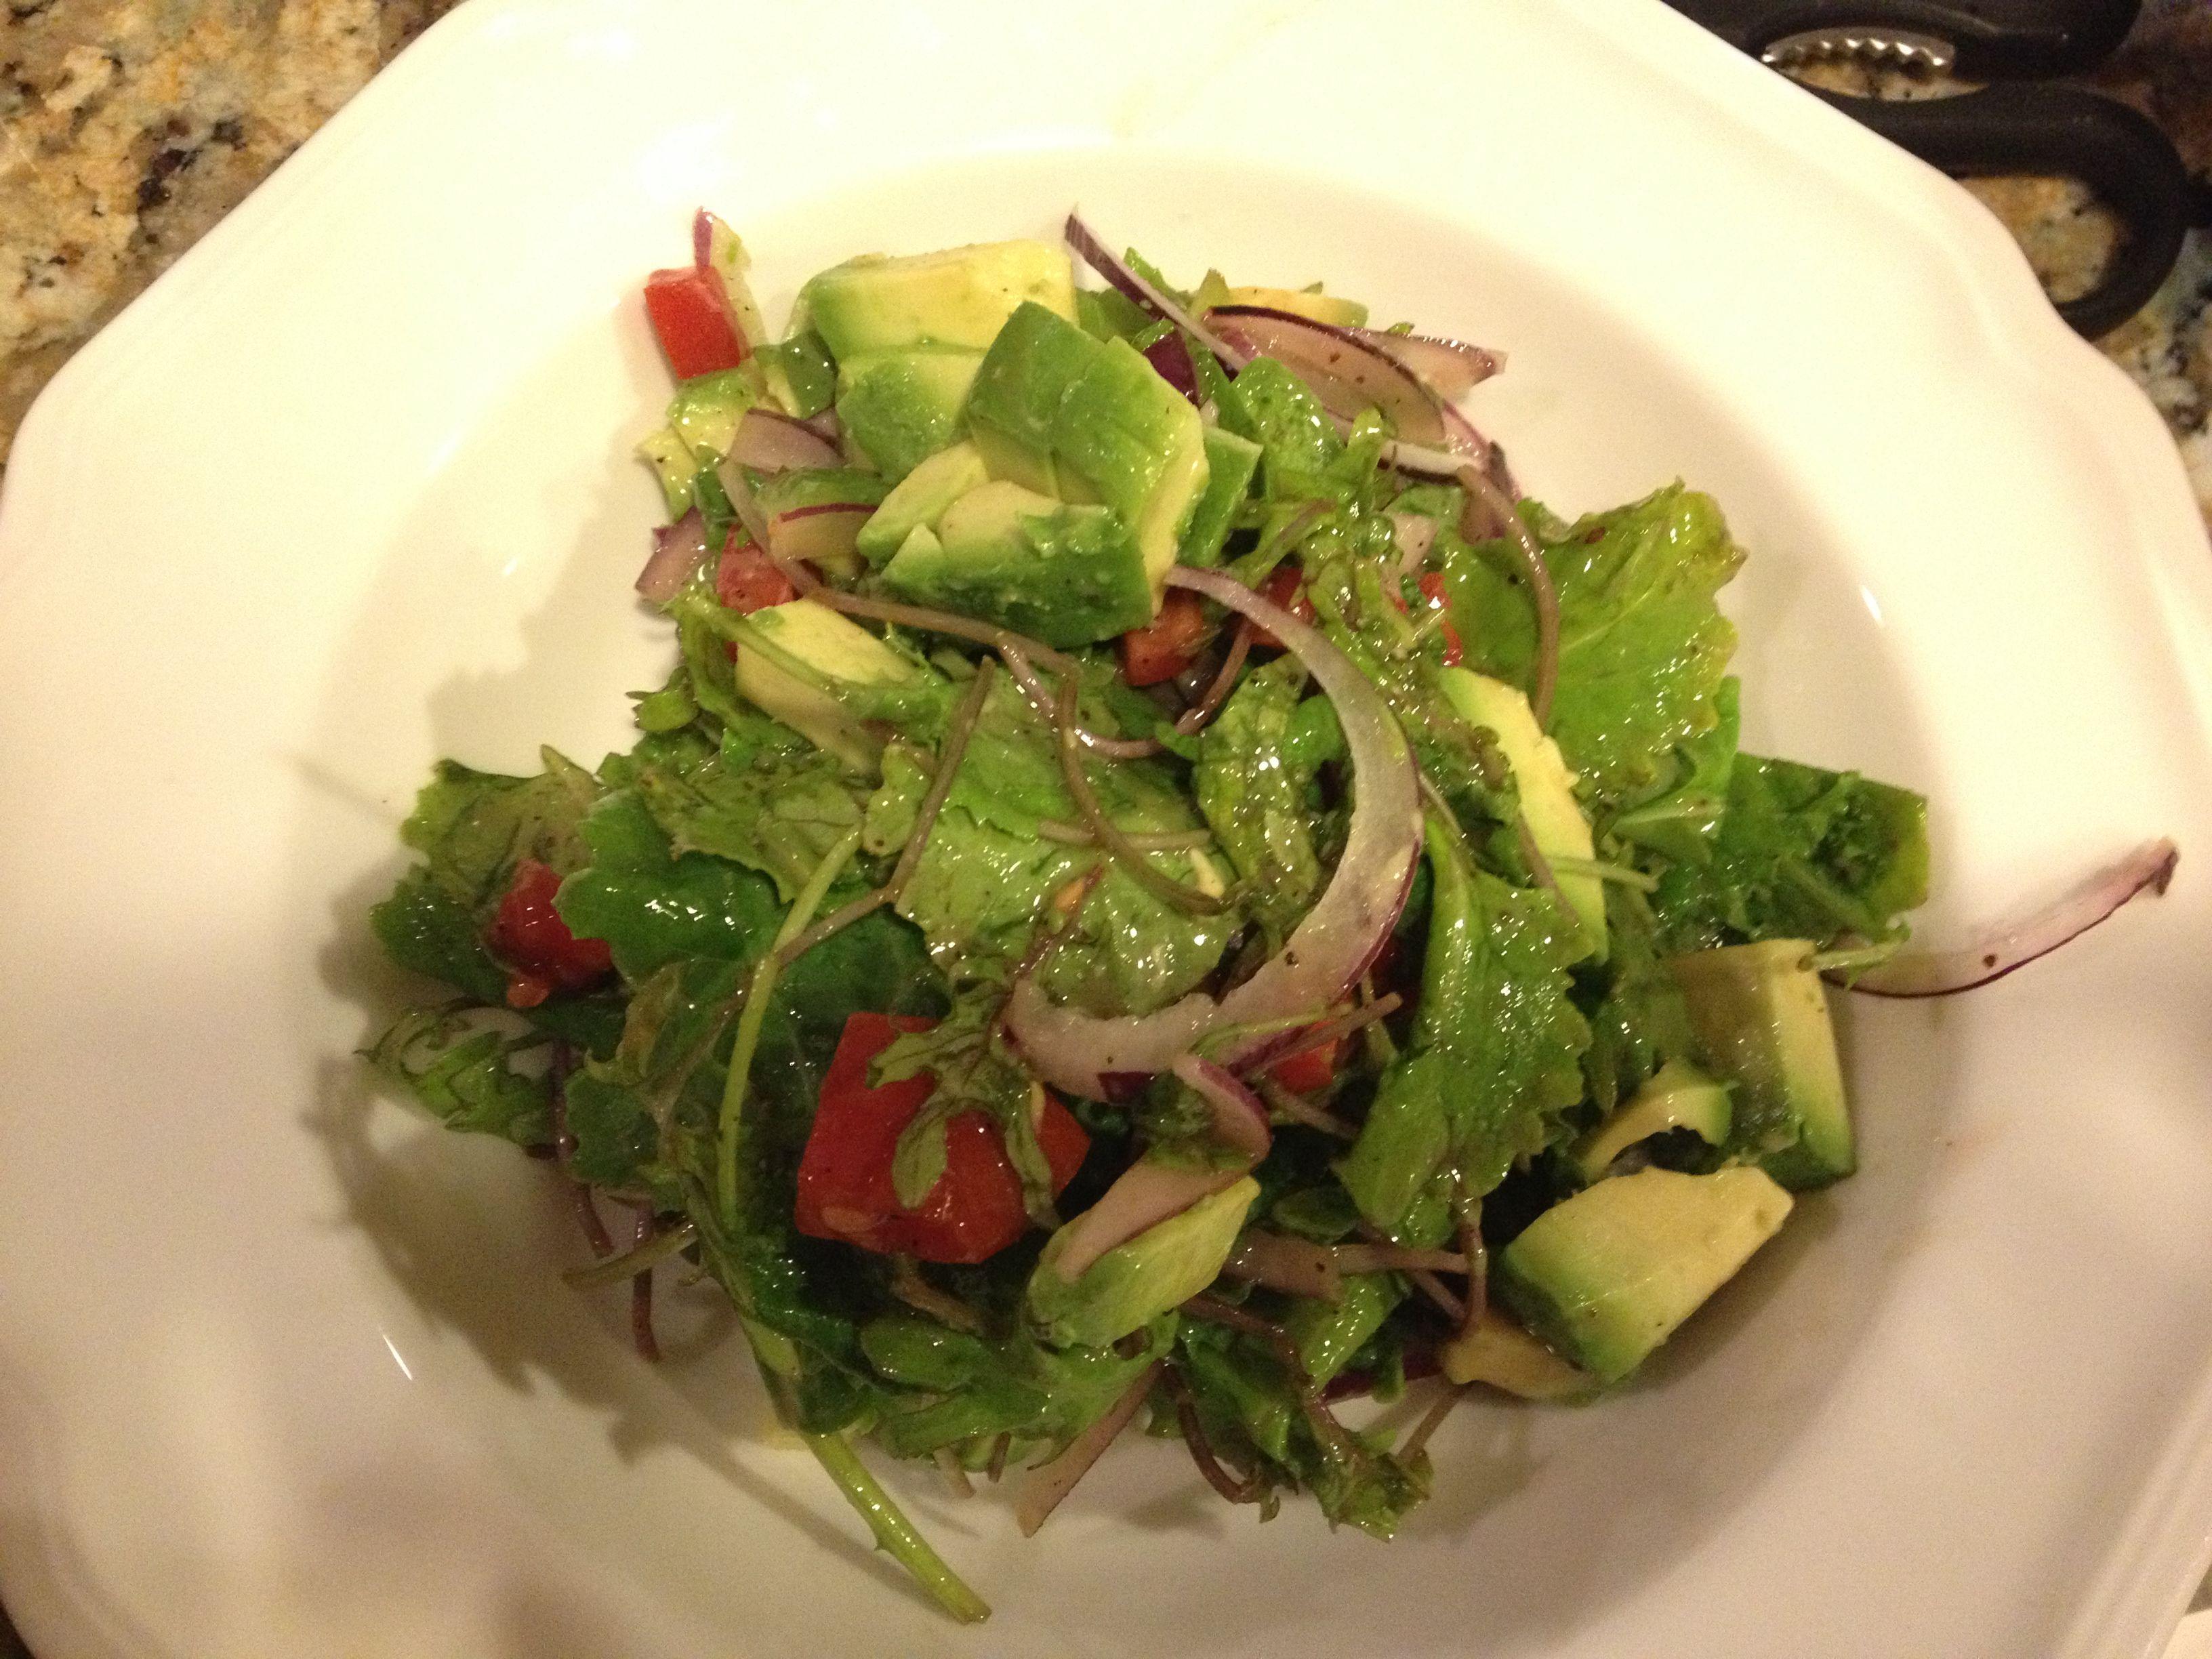 Organic Baby Kale Salad with Raspberry Vinaigrette, Red Onions, Avocado and Vine Ripe Tomatoes